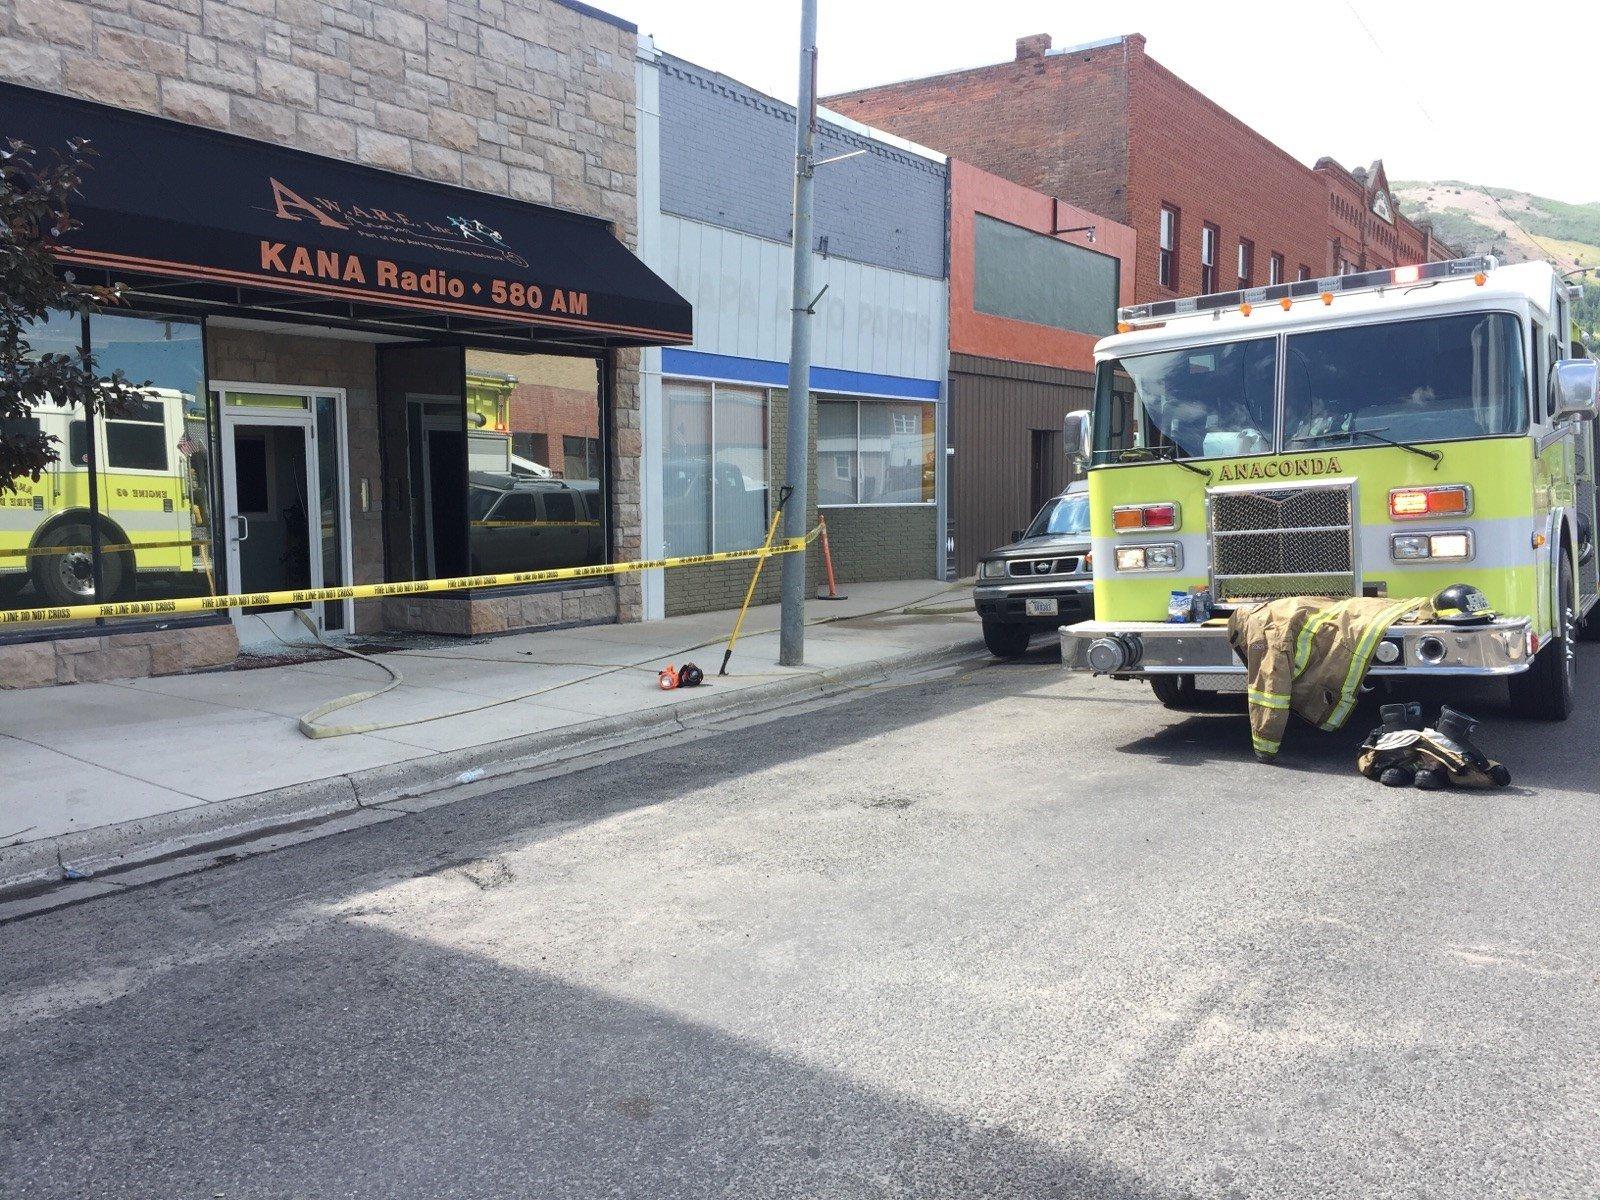 The fire was reported in Anaconda at 105 Main Street at KANA Radio. (MTN News photo)